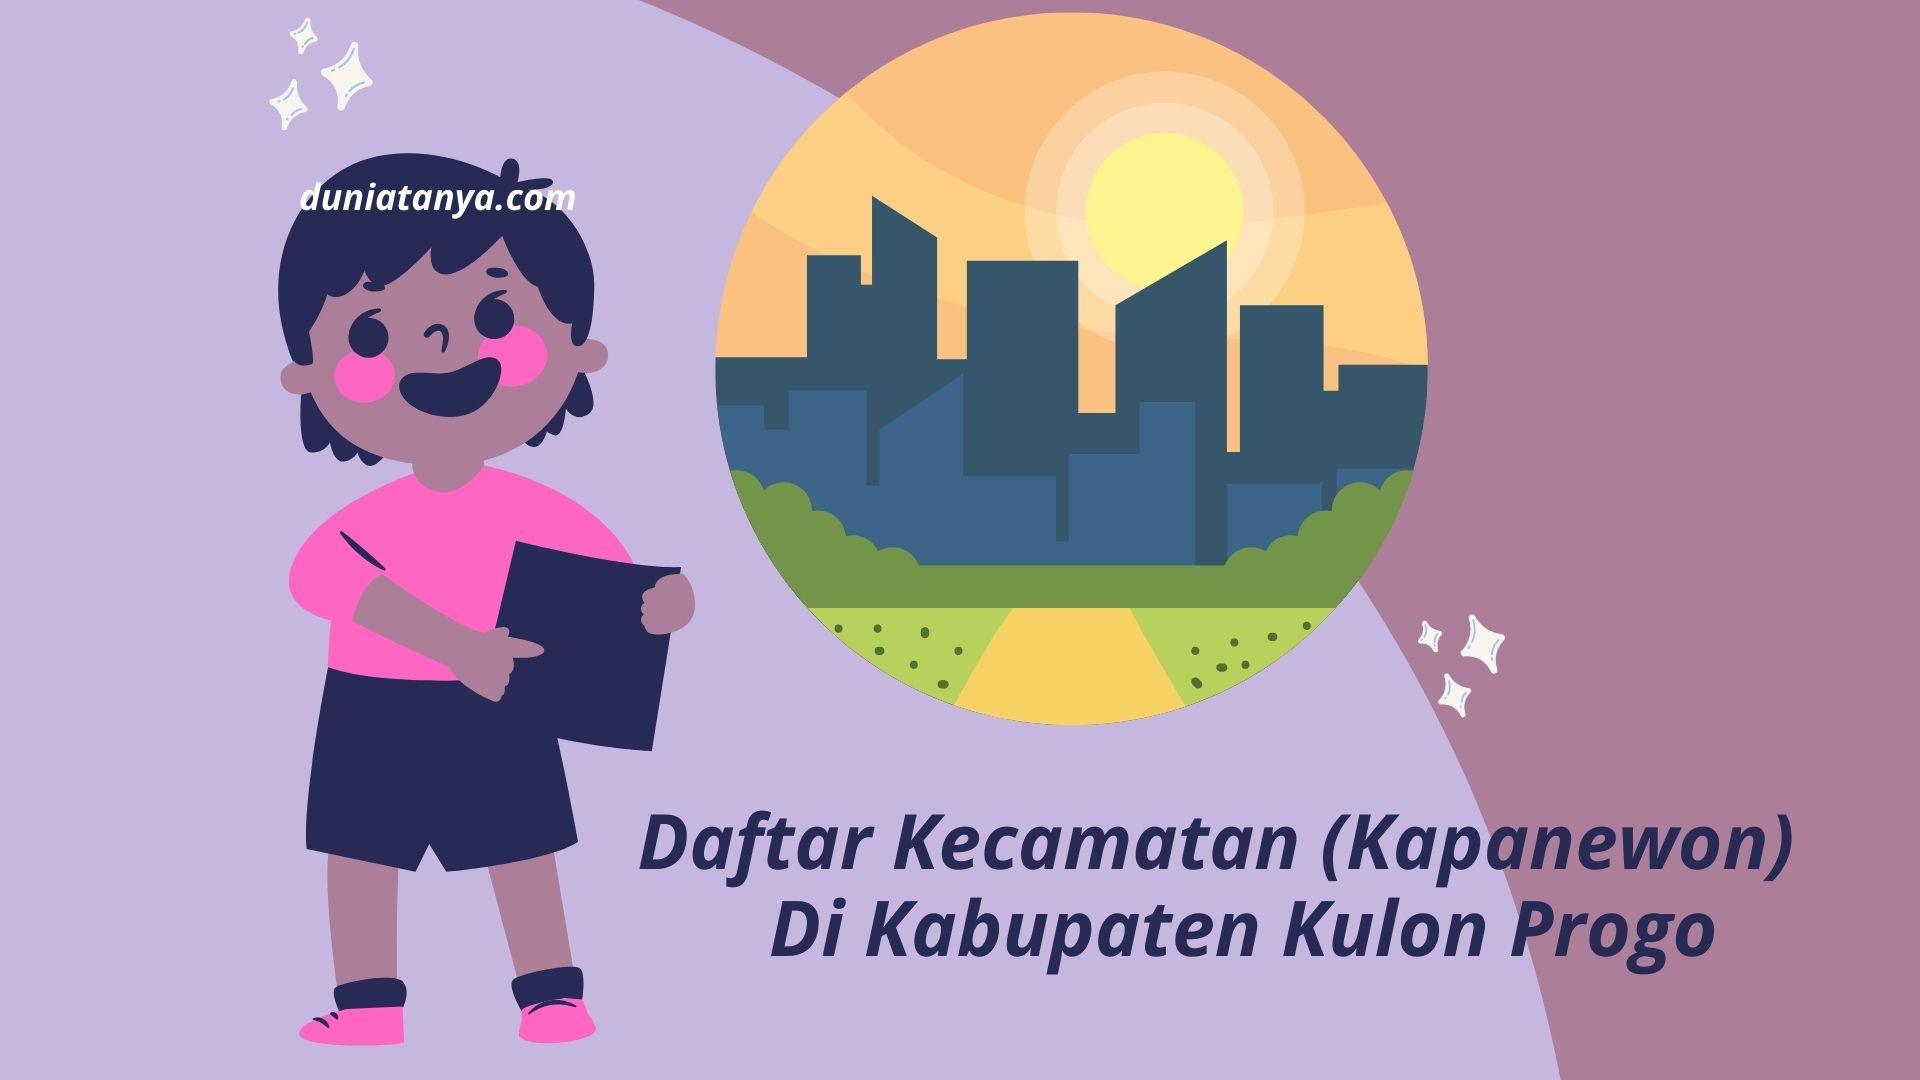 You are currently viewing Daftar Kecamatan (Kapanewon) Di Kabupaten Kulon Progo